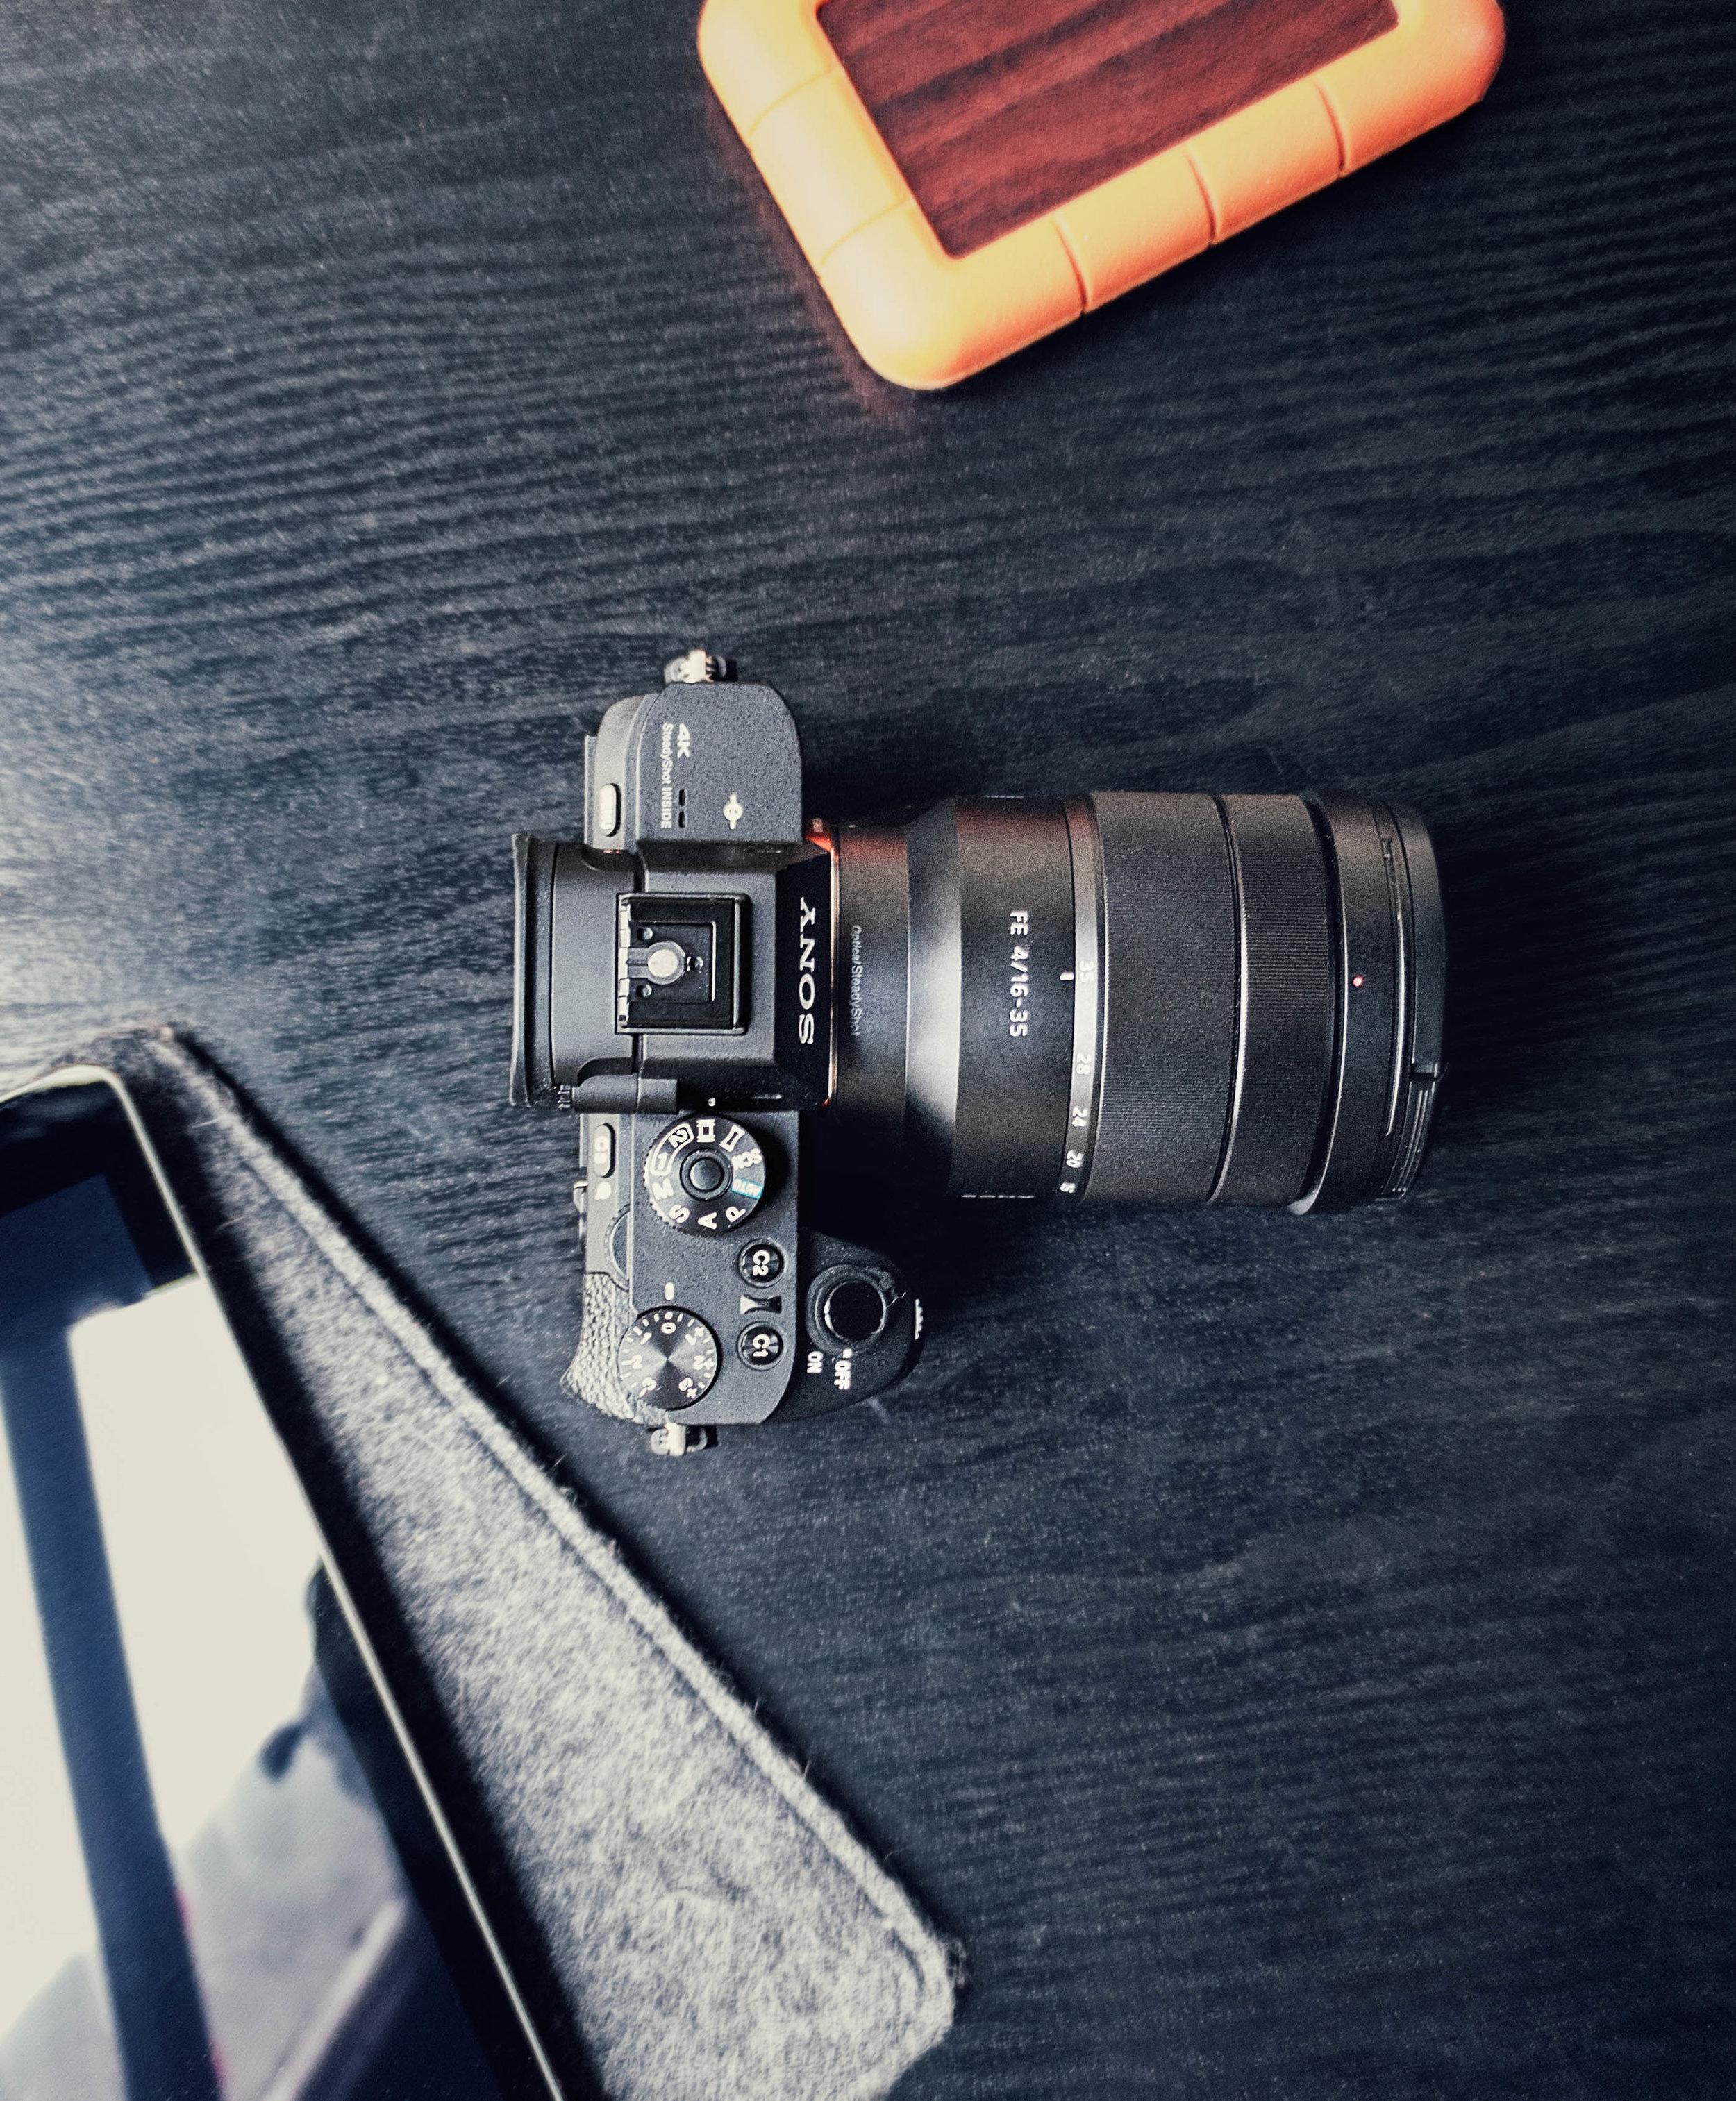 Disque dur, iPad, caméra - Ambiance tech